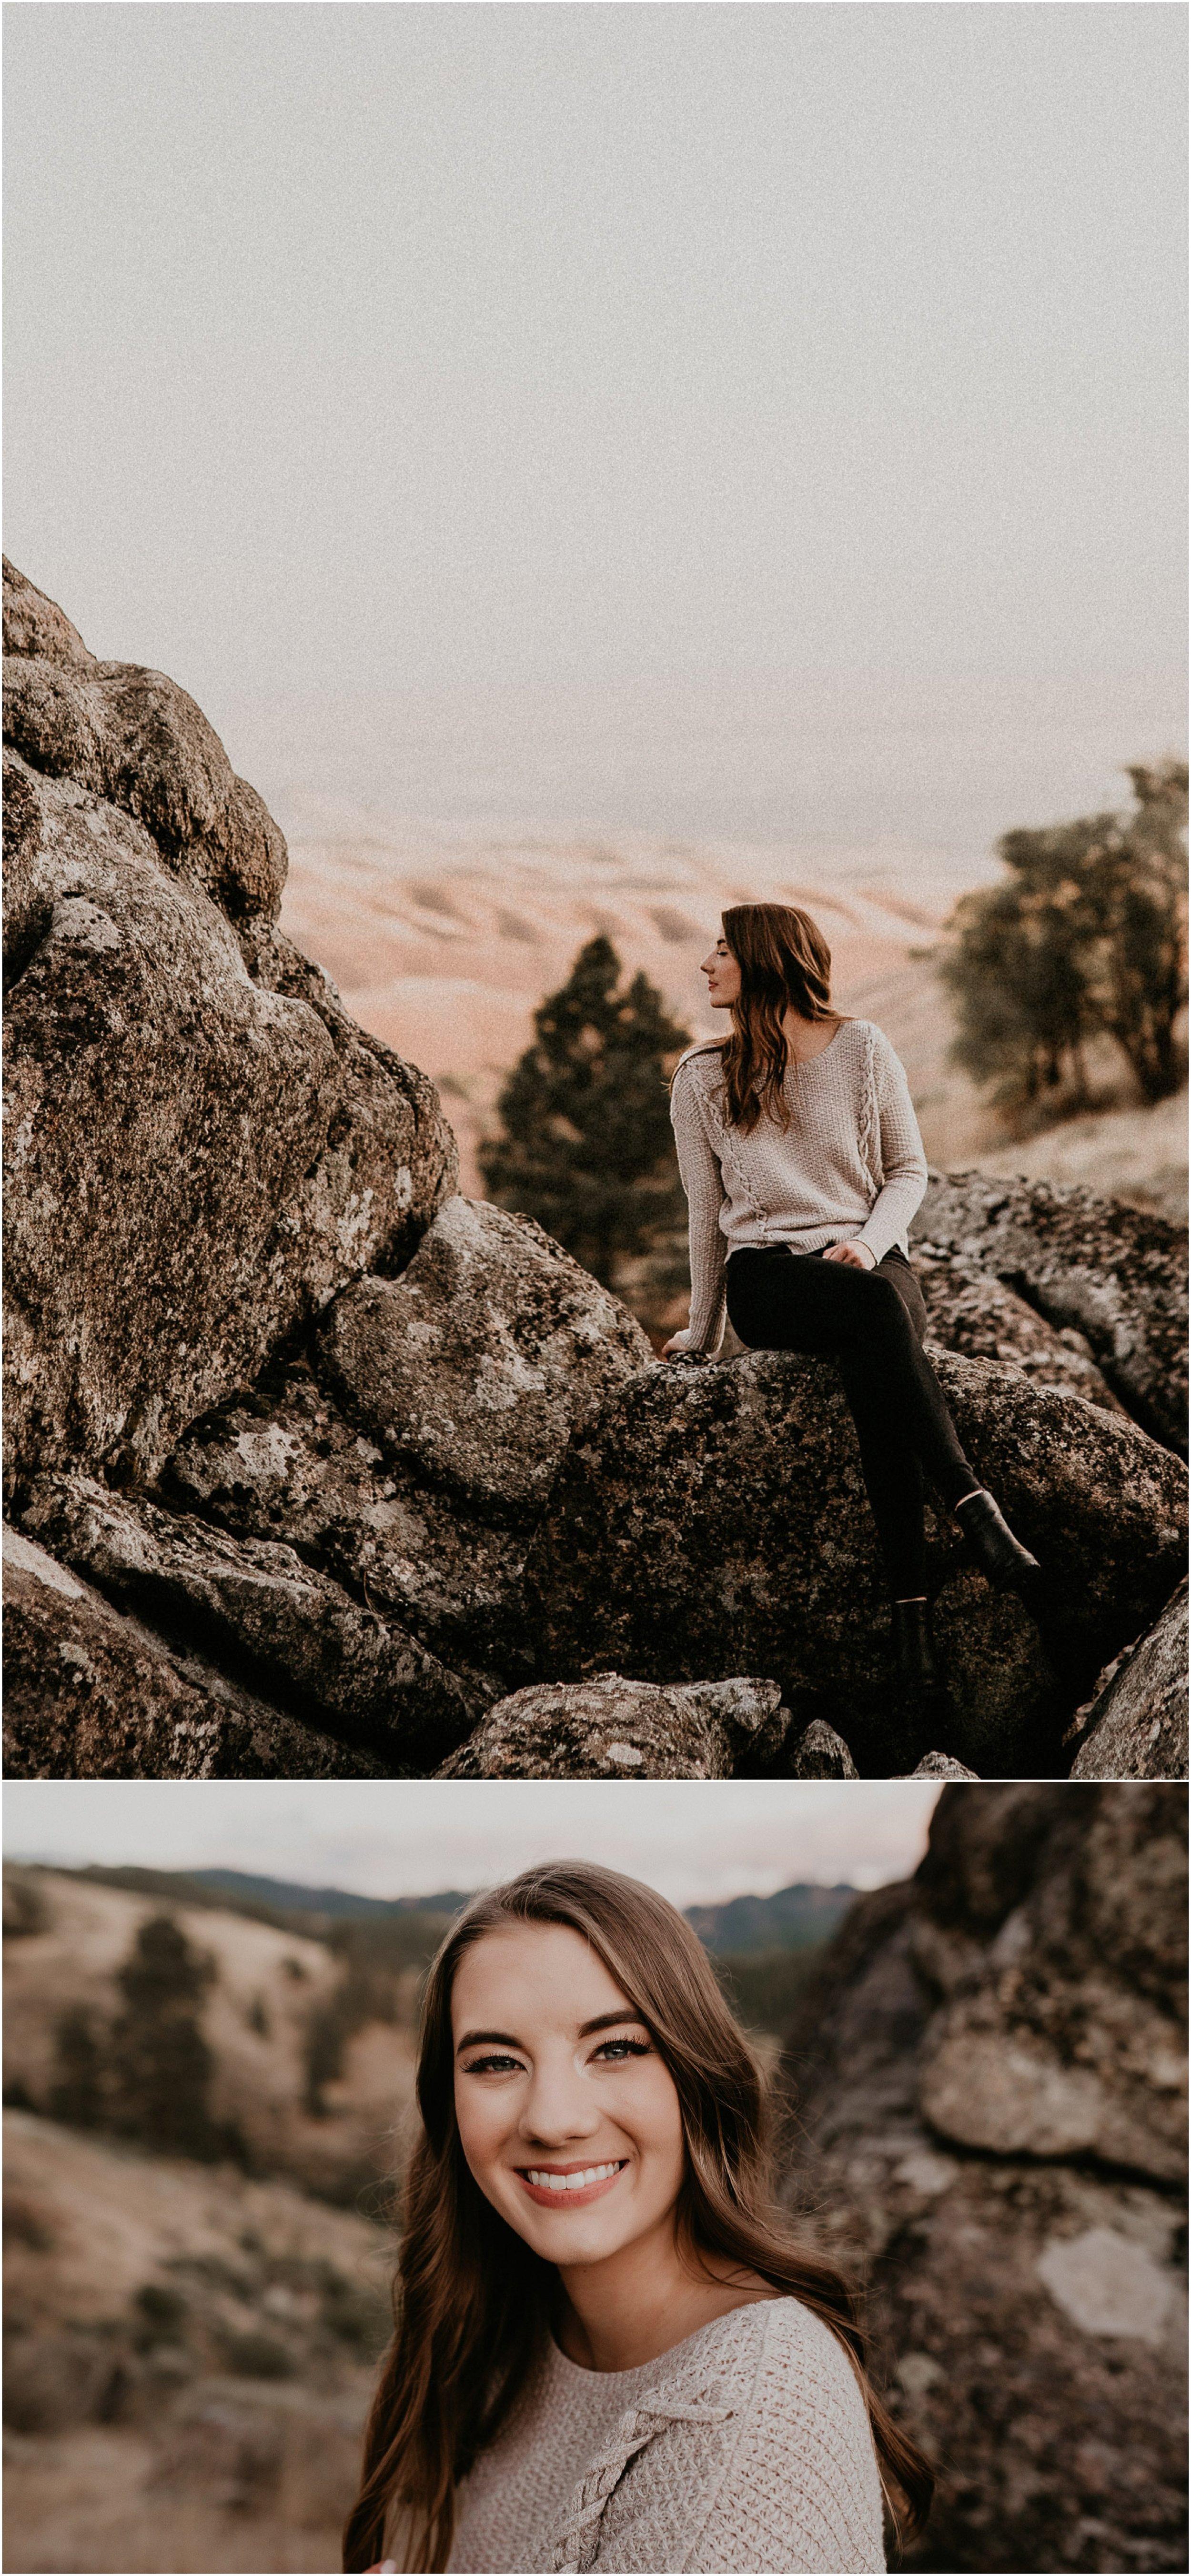 Boise Senior Photographer Makayla Madden Photography Bogus Basin Senior Girl Boise Mountains Adventure Sunset